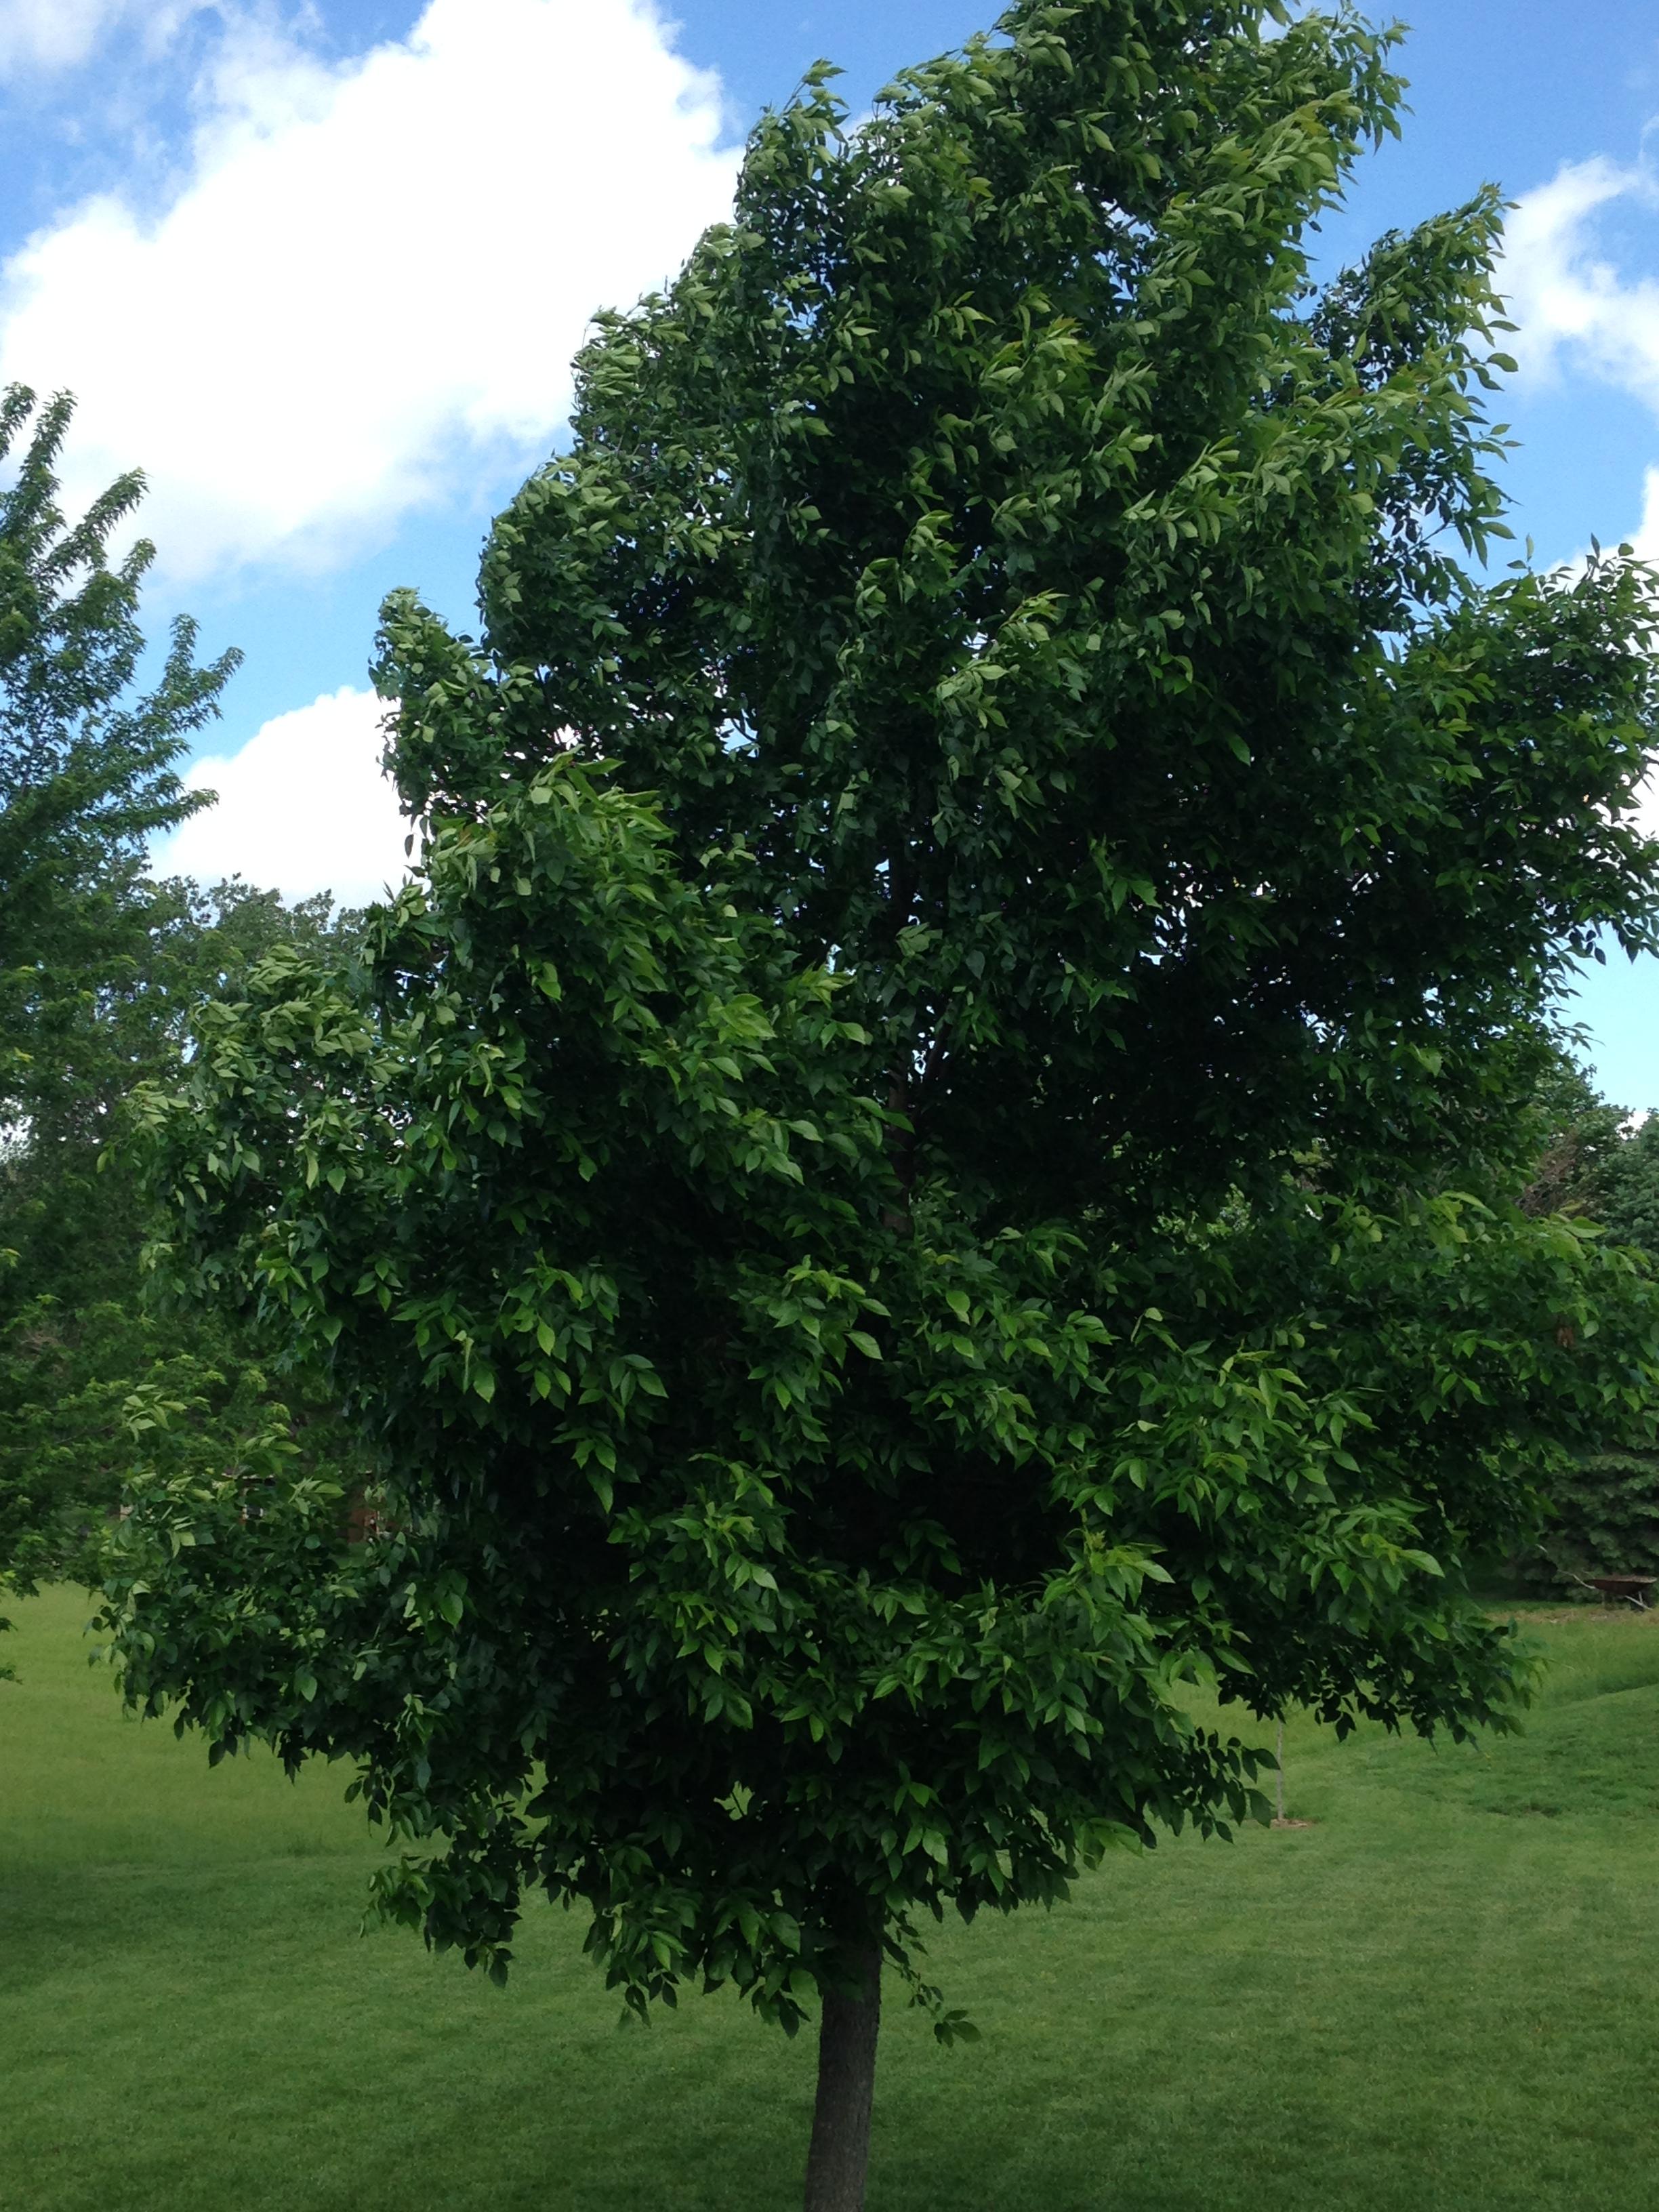 Background - Summer Tree